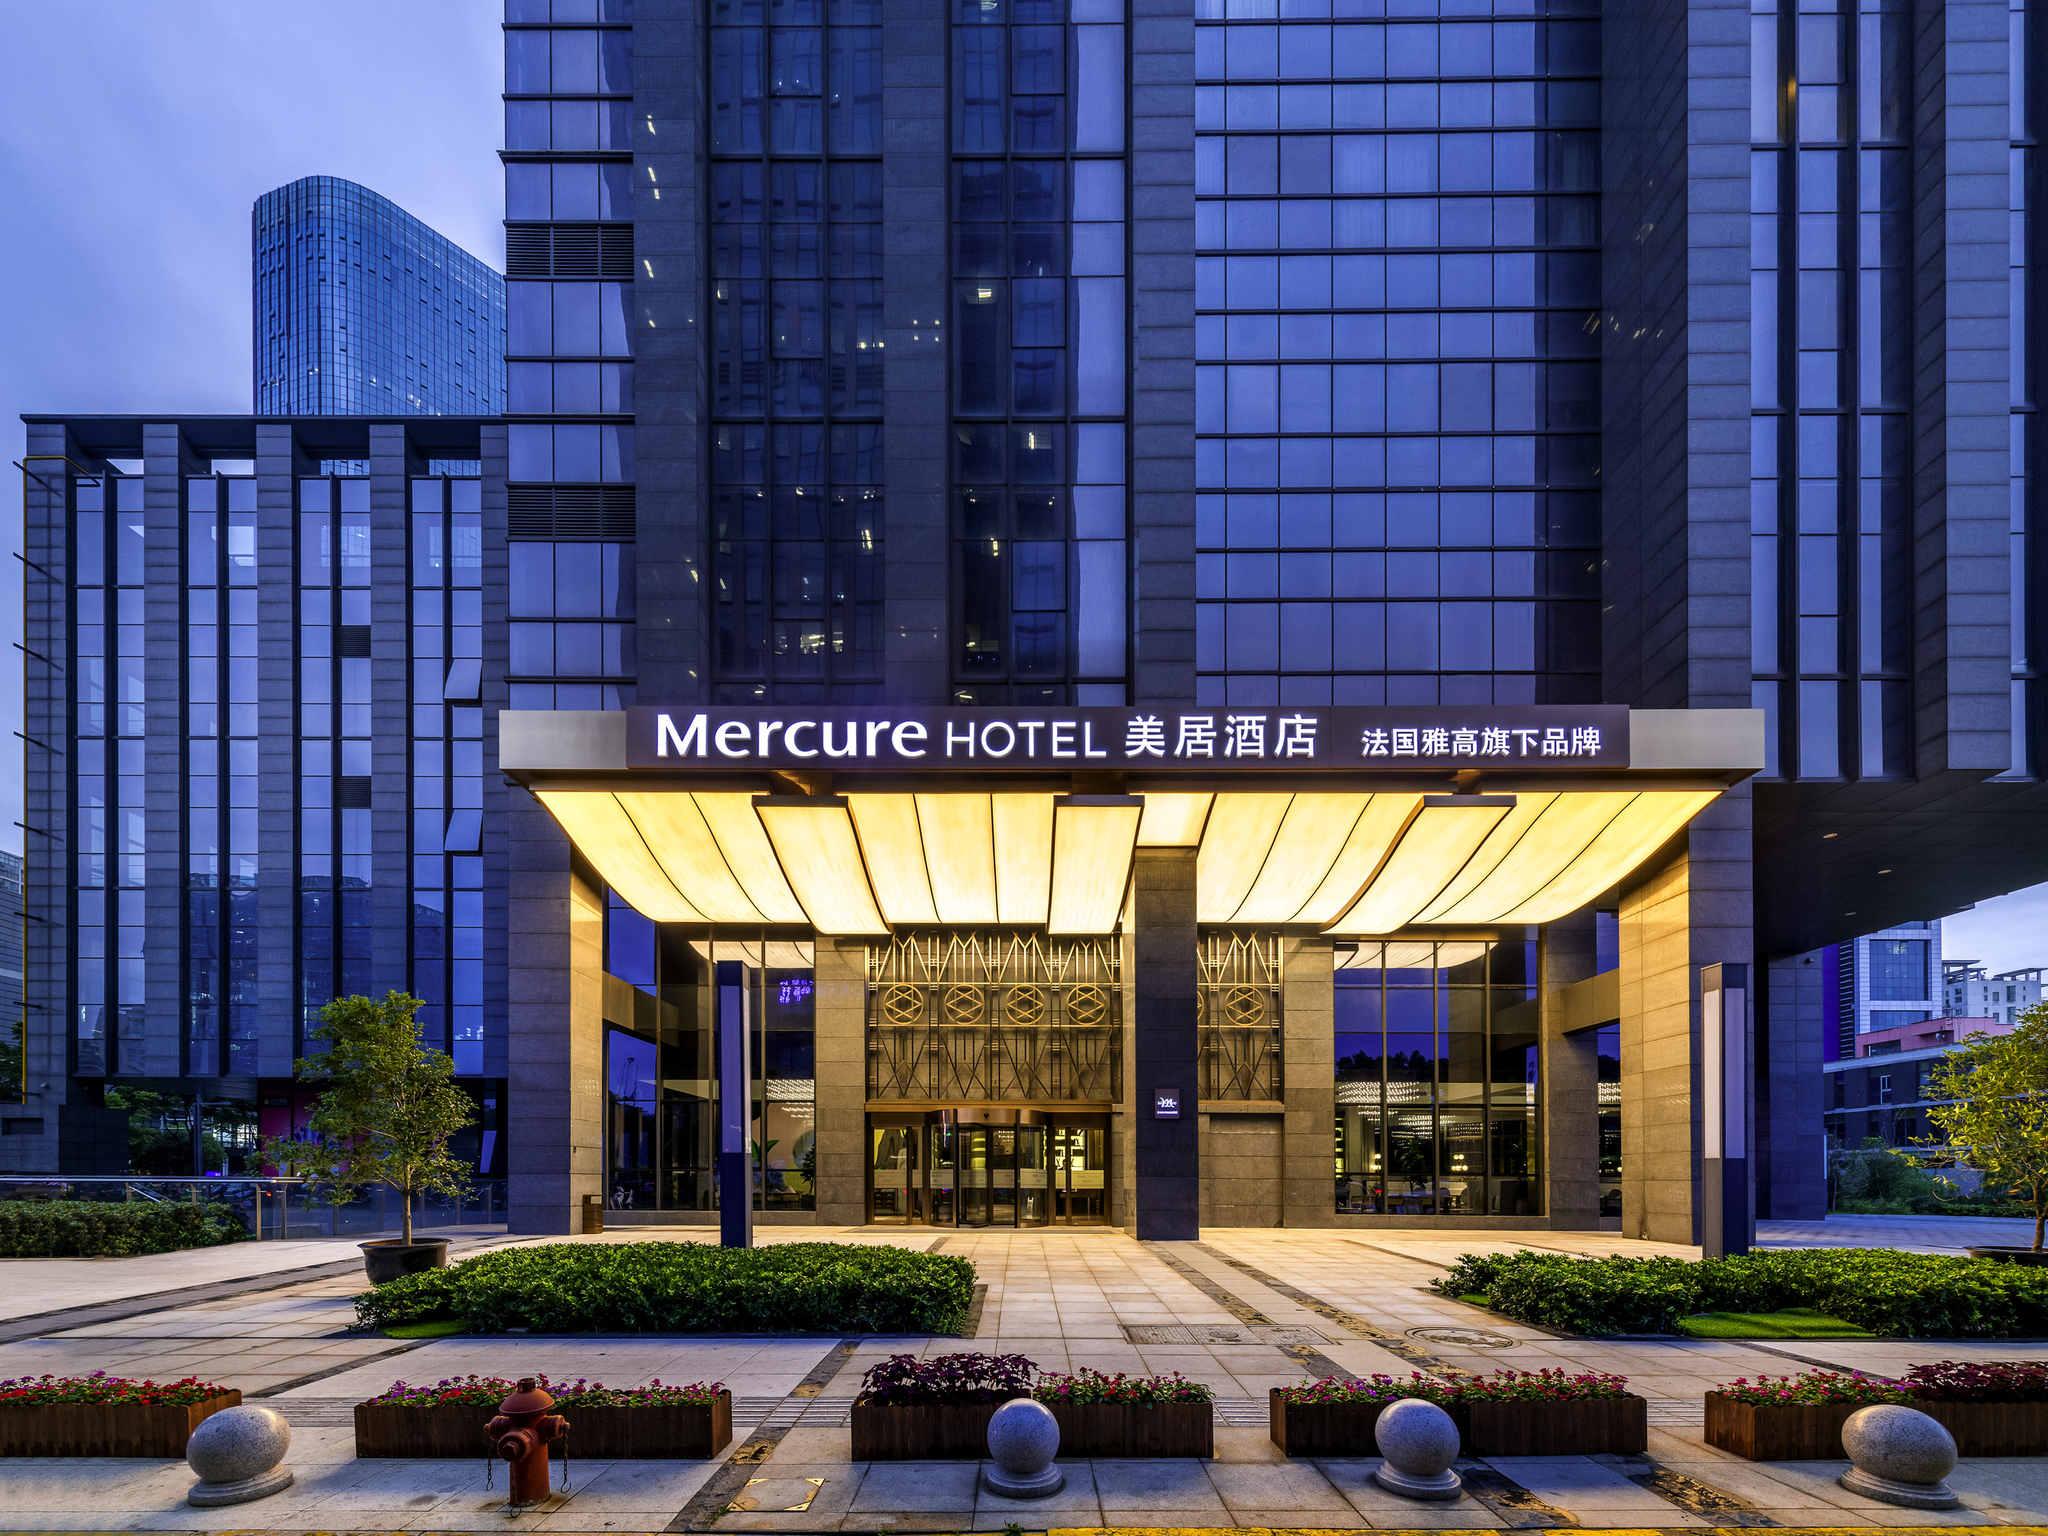 Hotel – Mercure Suzhou Jinji Lake (apertura agosto 2018)